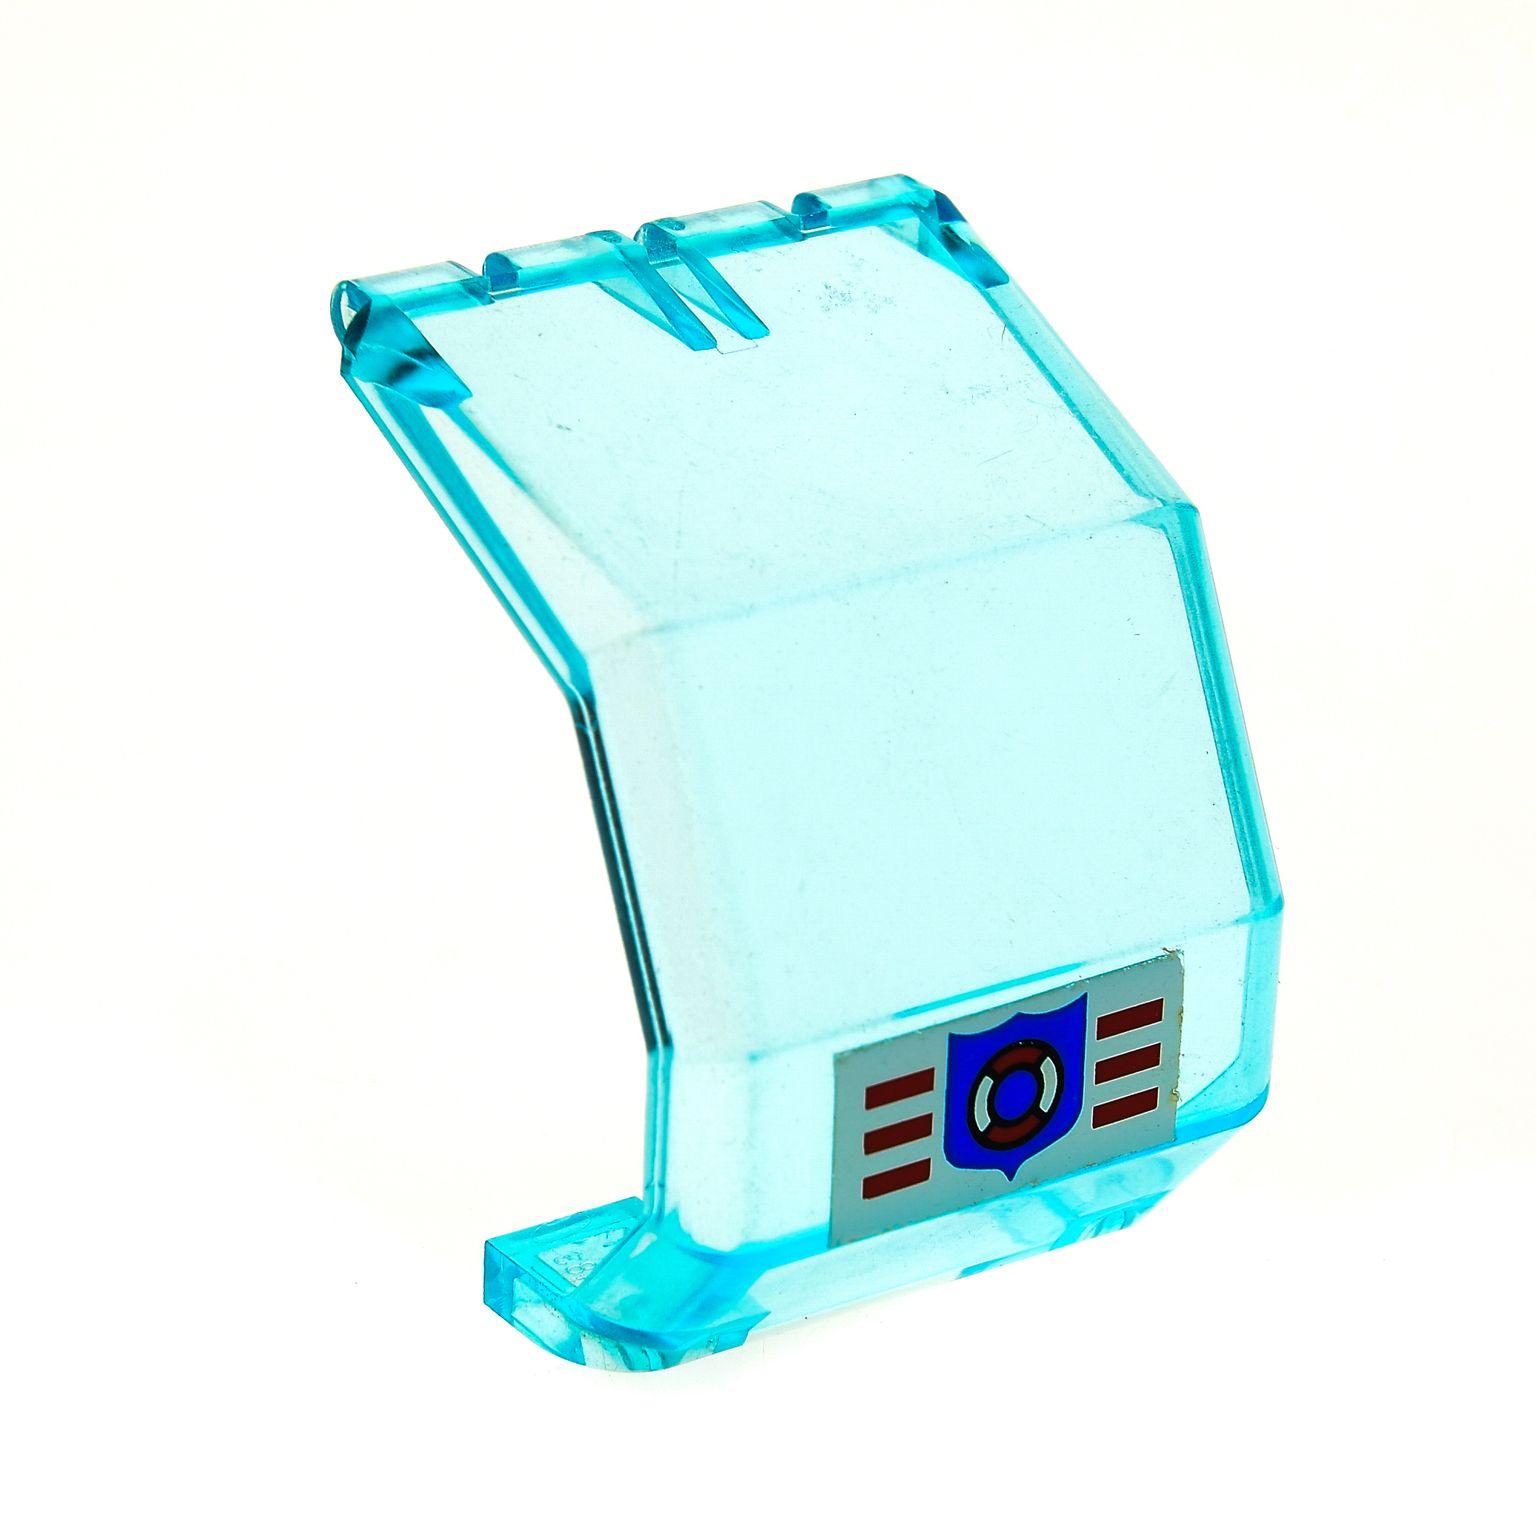 1x Lego Windschutzscheibe hell blau 4x4x4 Coast Guard Logo Fenster 6342 2483pb05